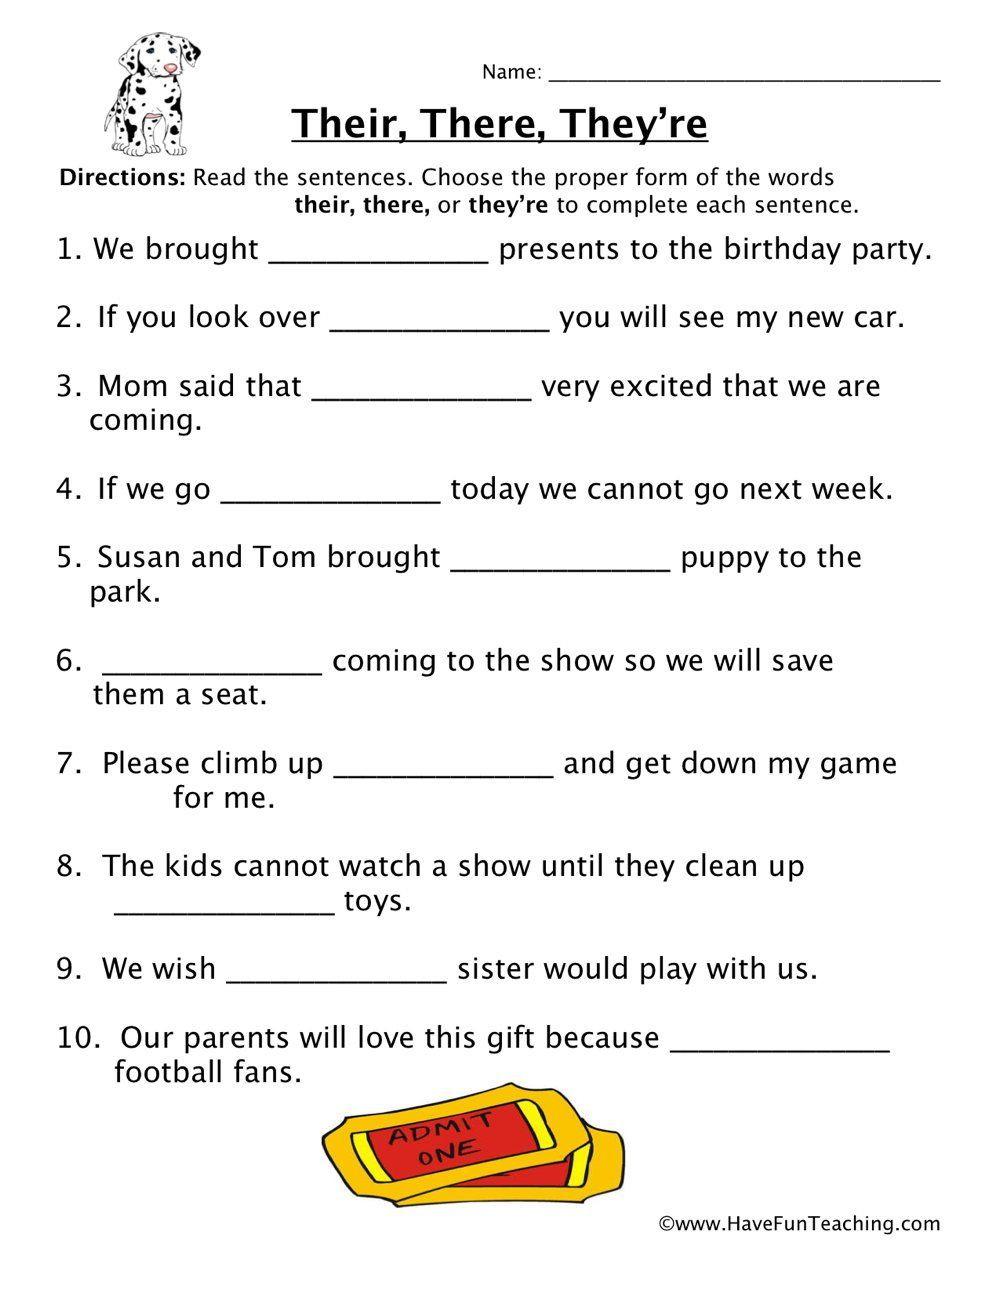 Homophone Worksheet 4th Grade their there they Re Homophones Worksheet In 2020